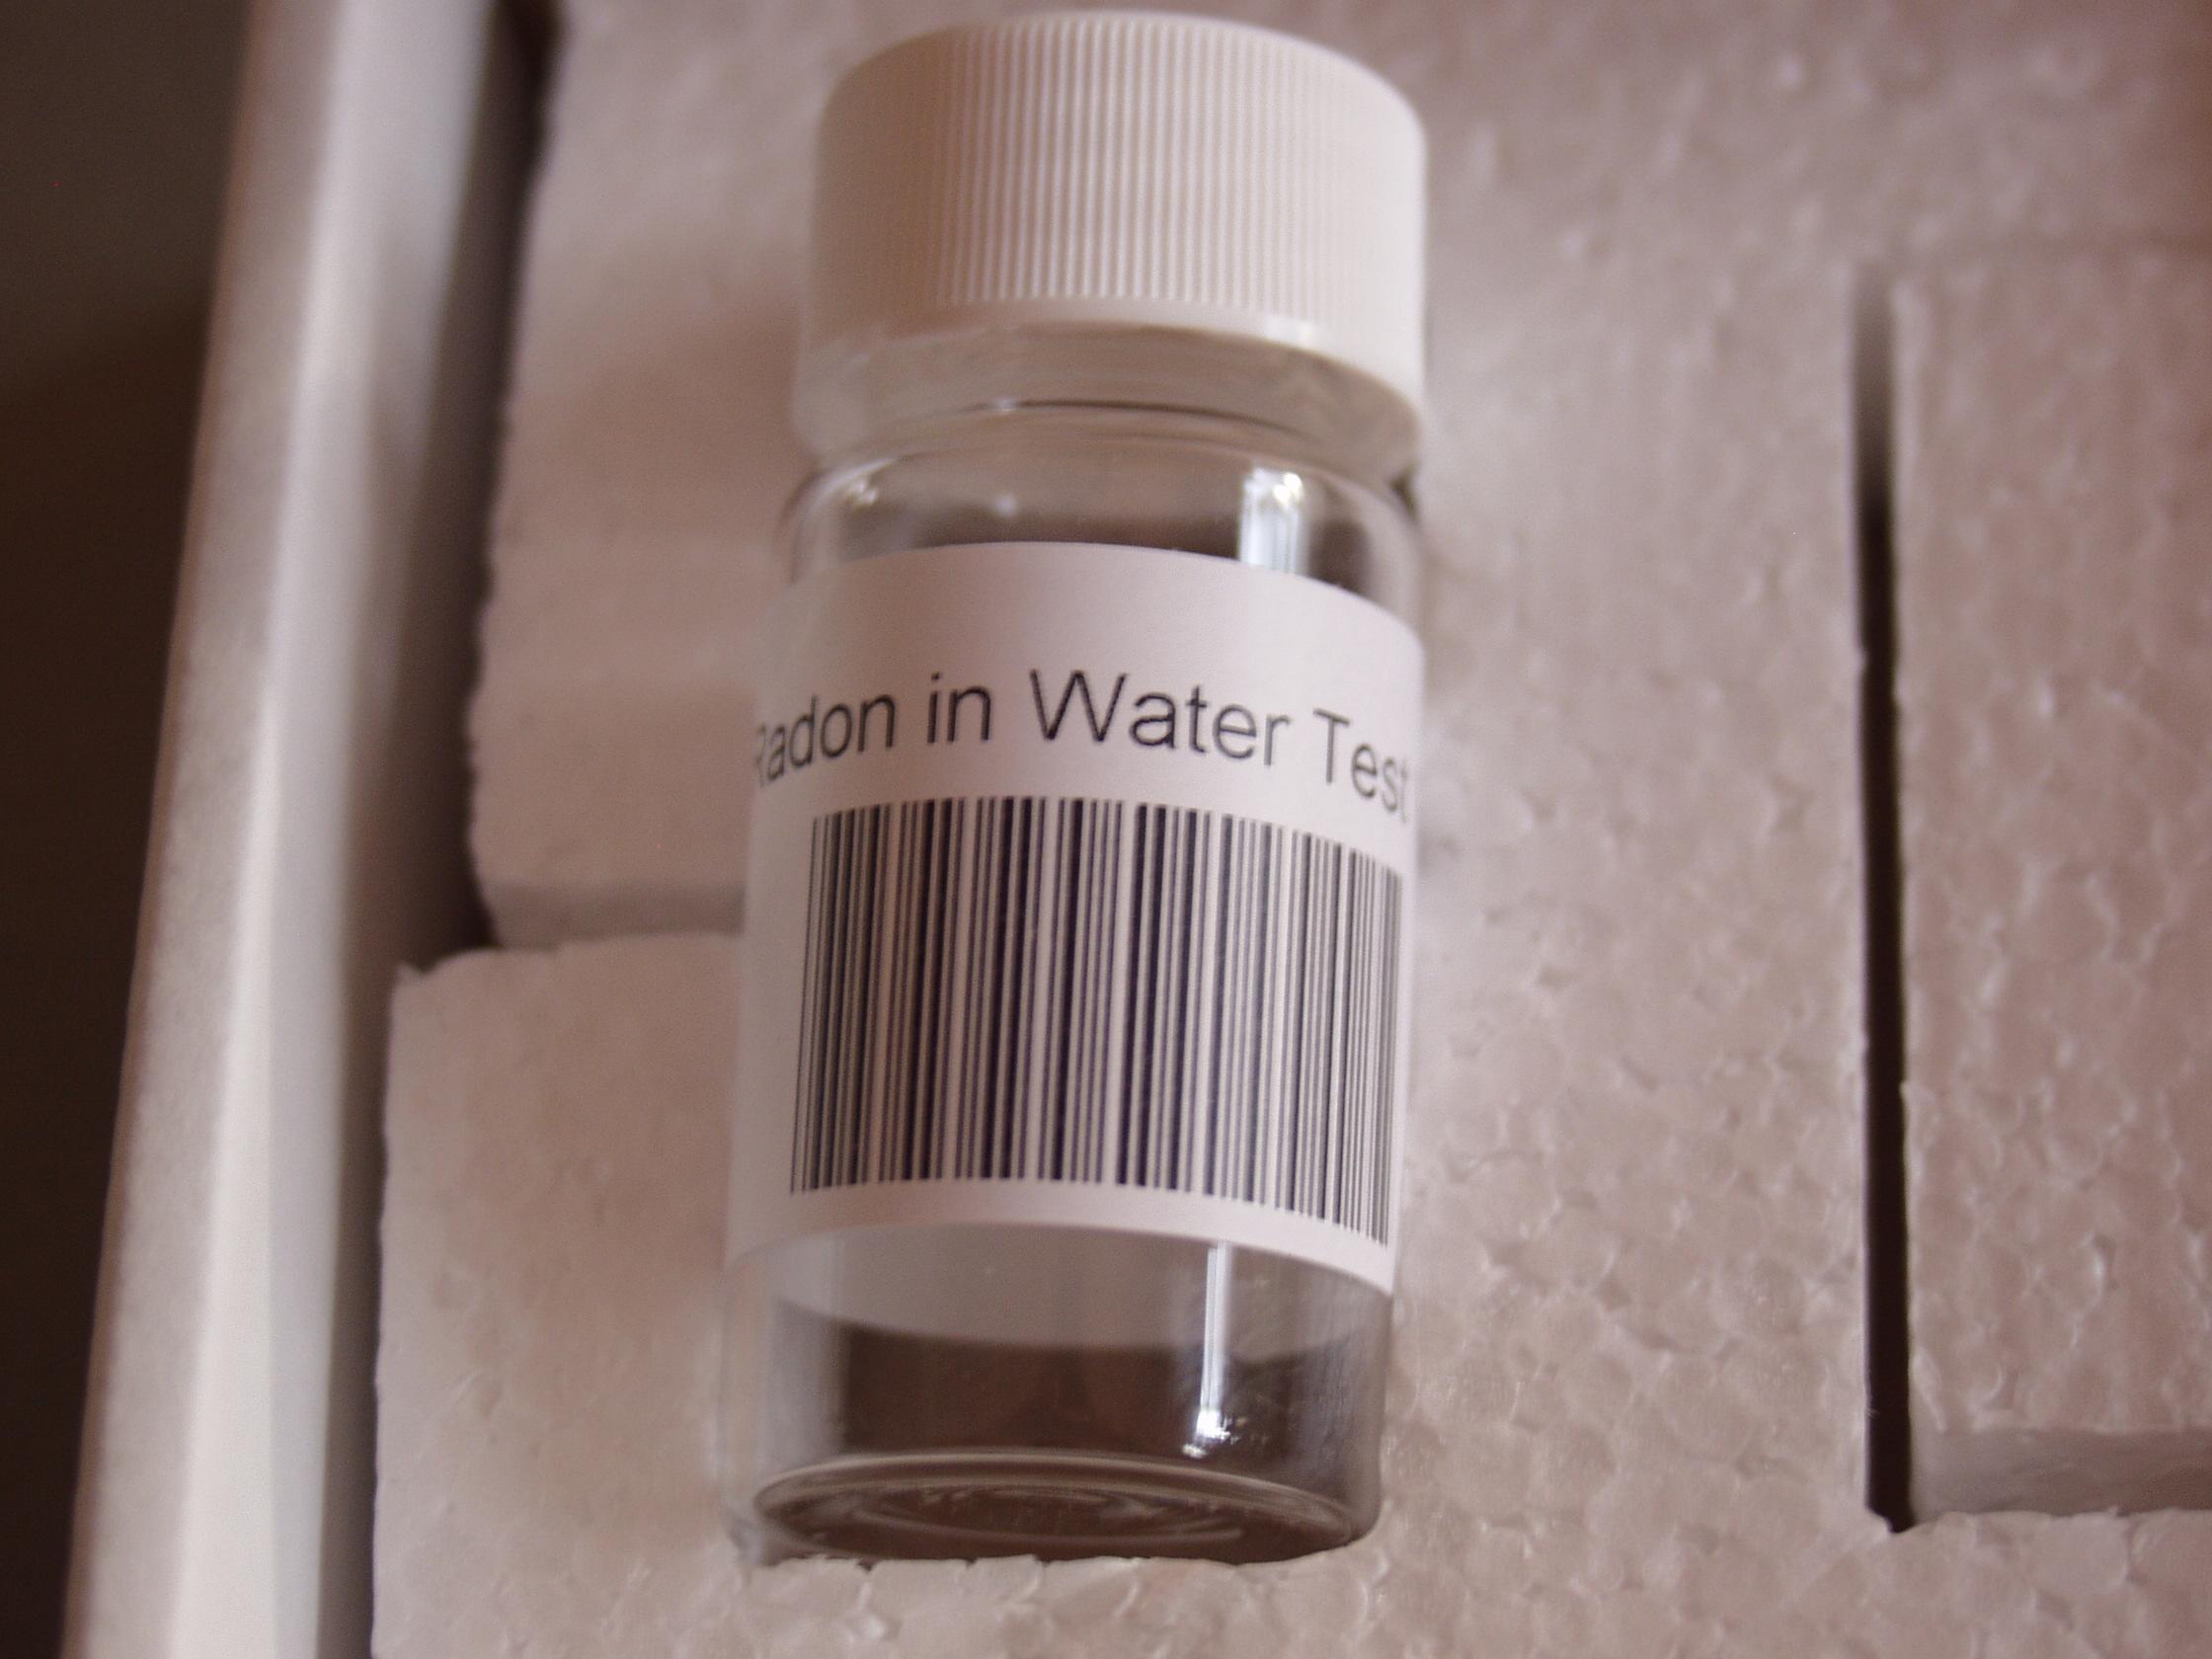 Testing for radon in water